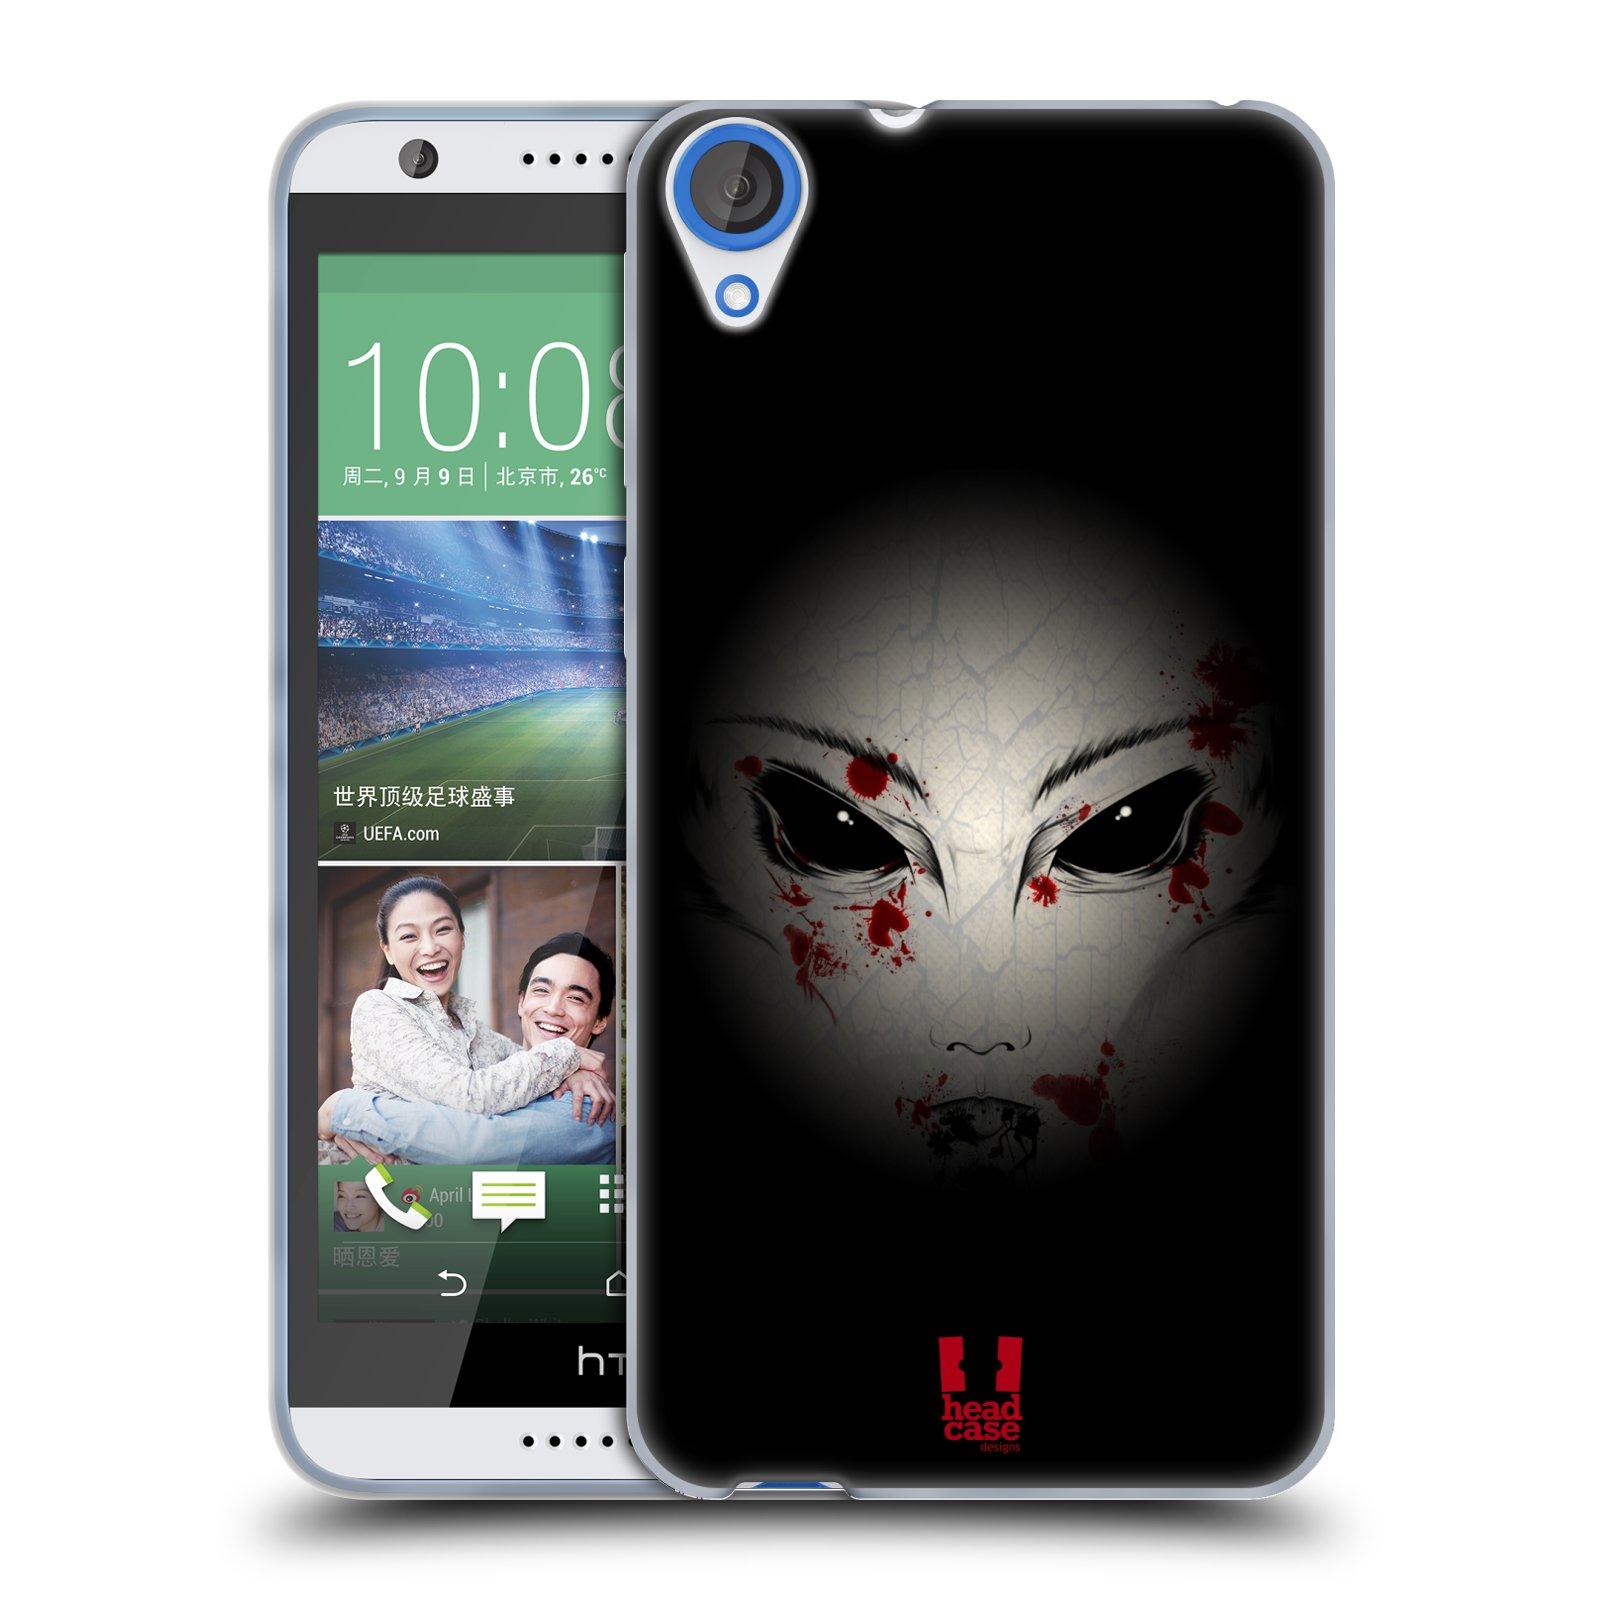 Silikonové pouzdro na mobil HTC Desire 820 HEAD CASE Macabre (Silikonový kryt či obal na mobilní telefon HTC Desire 820)